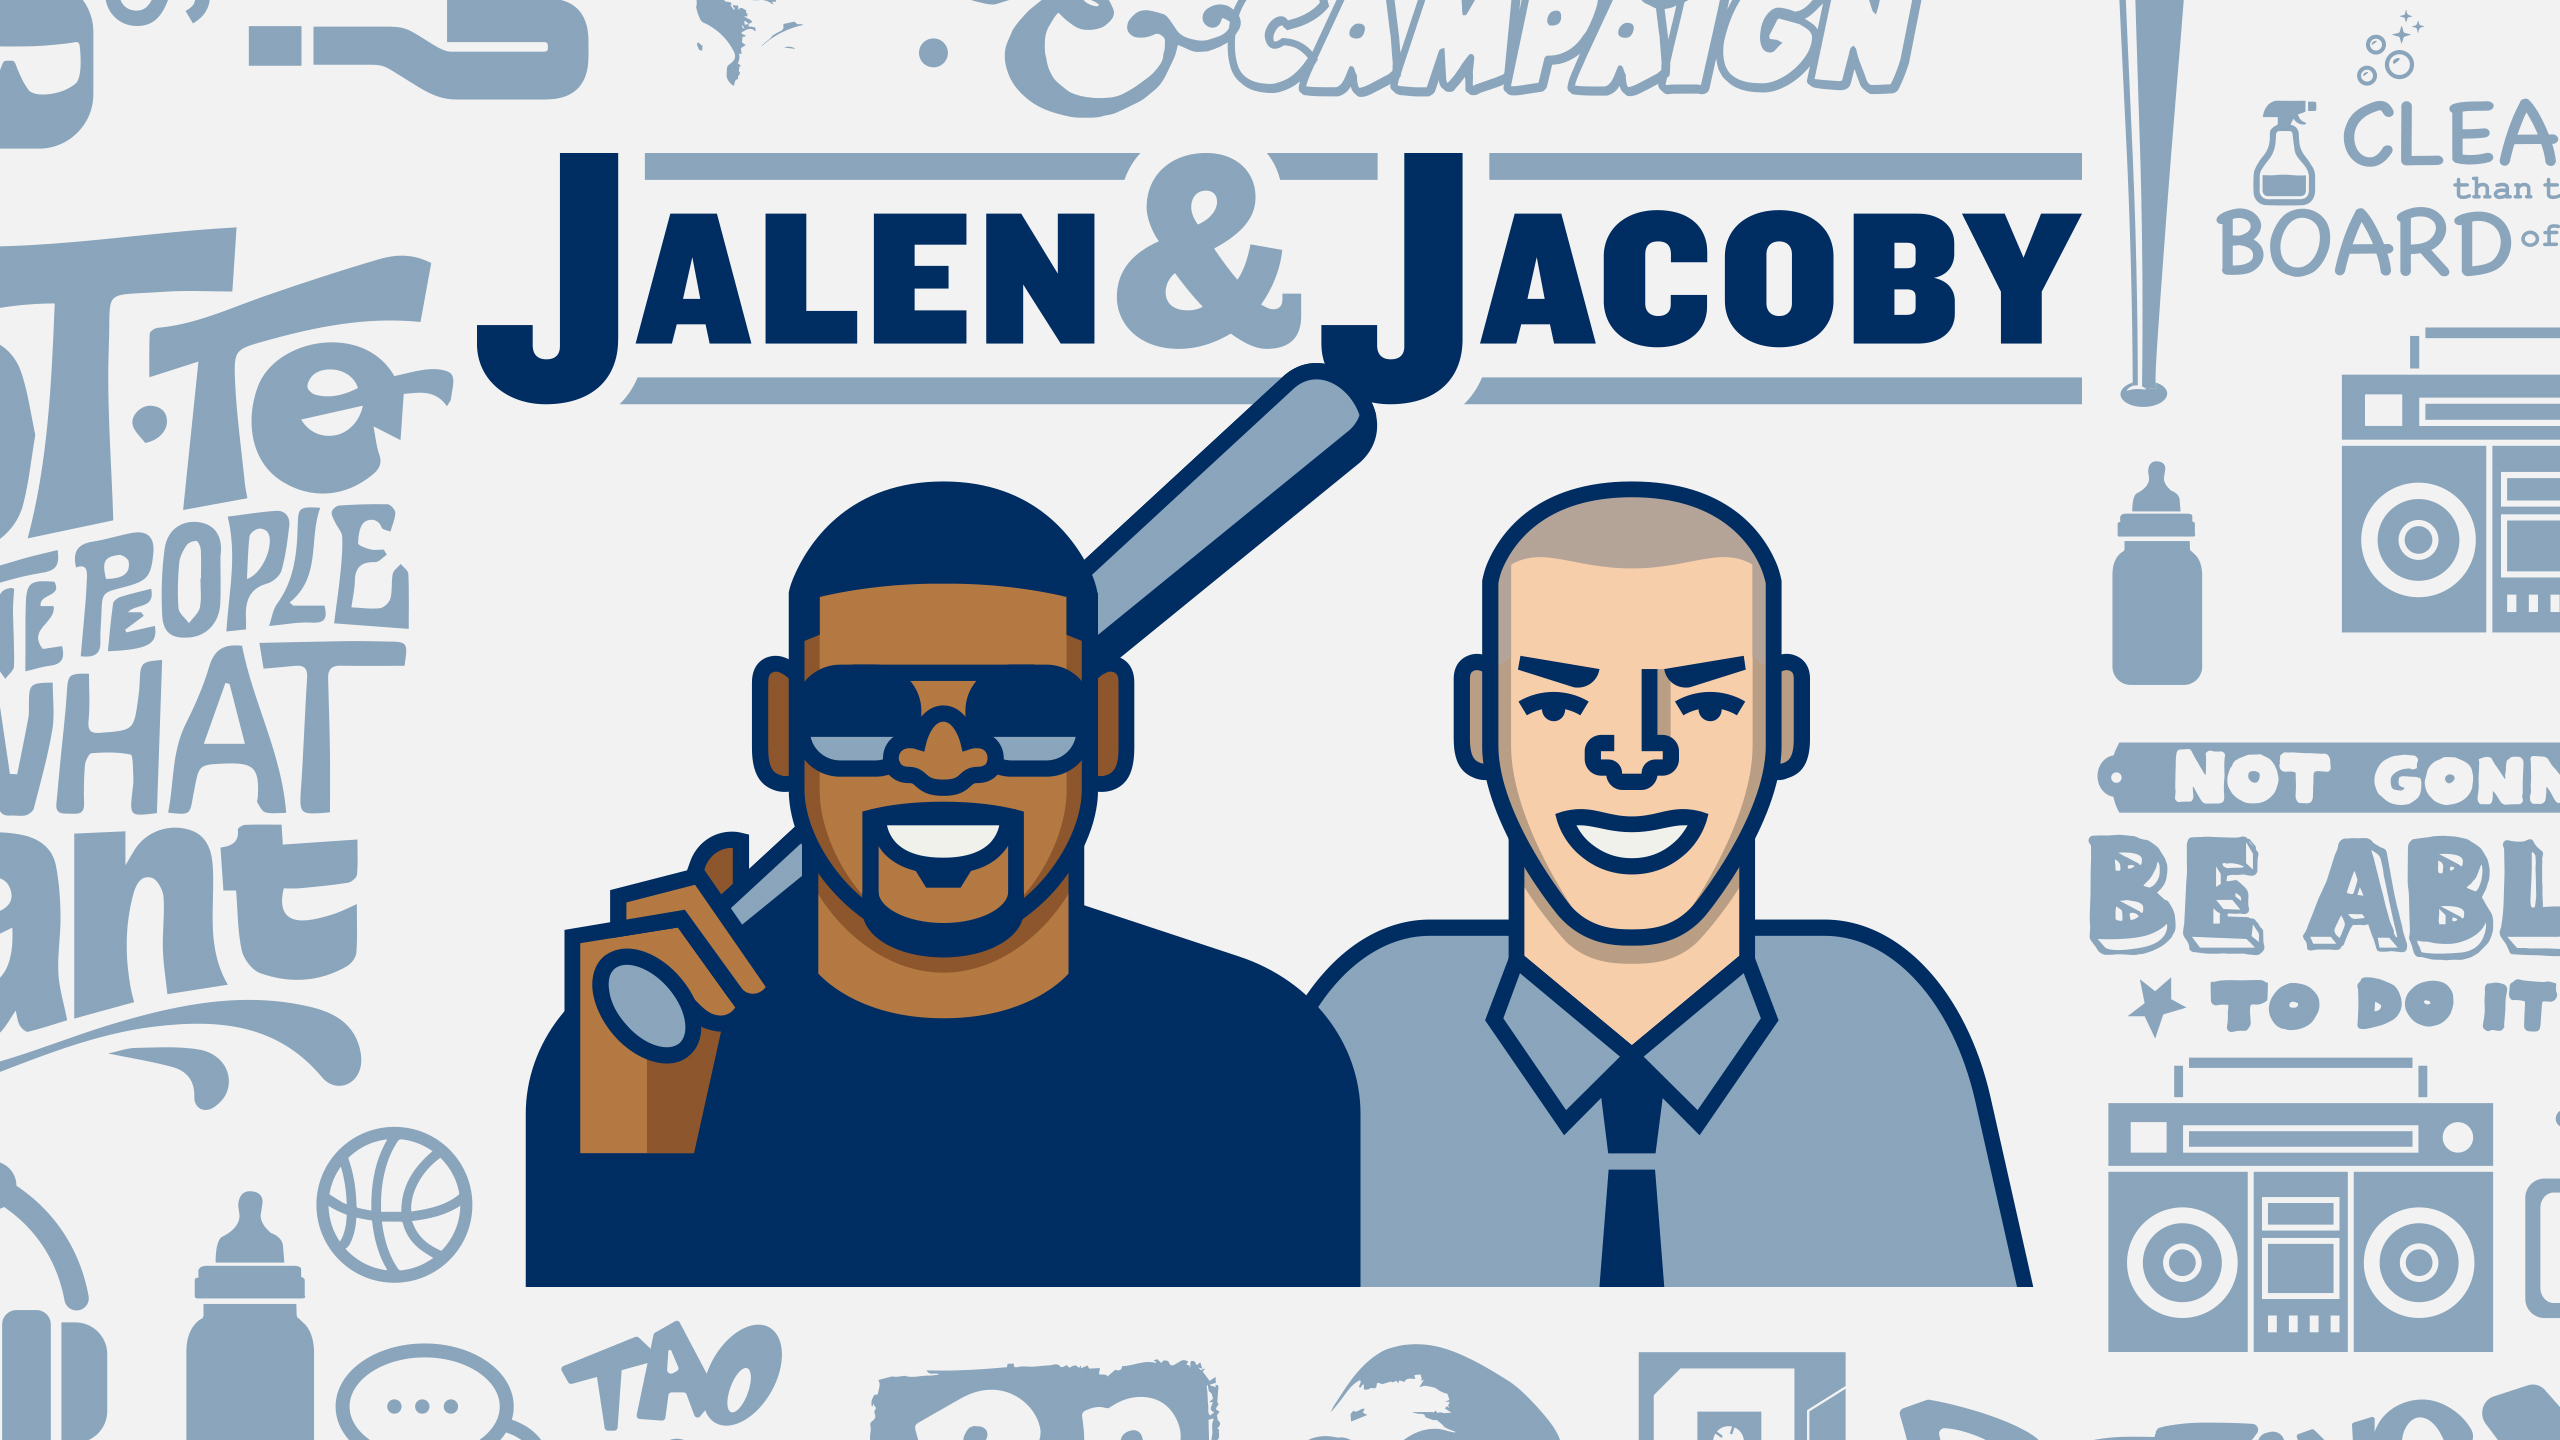 Mon, 2/18 - Jalen & Jacoby